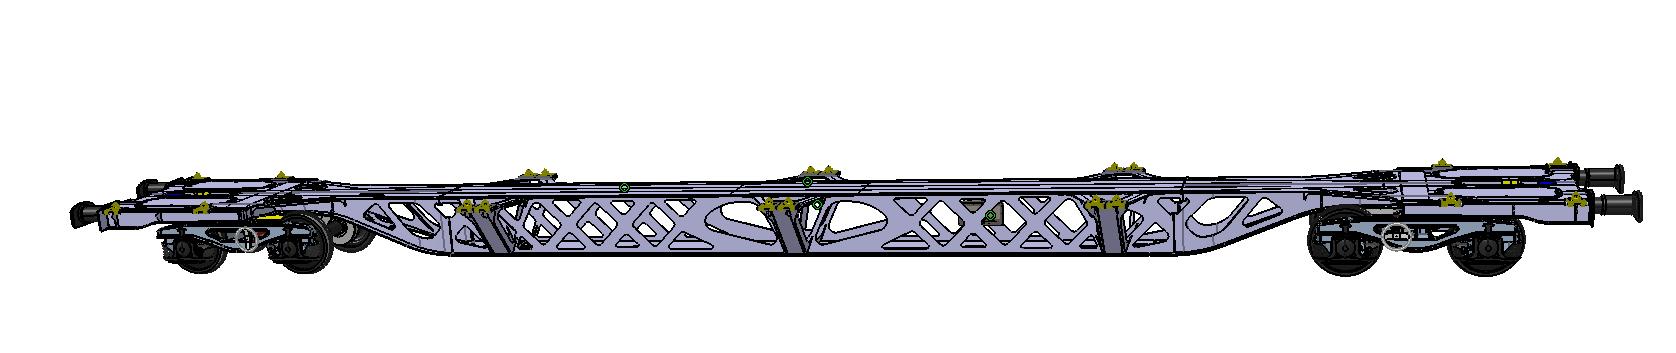 konstruktion-2